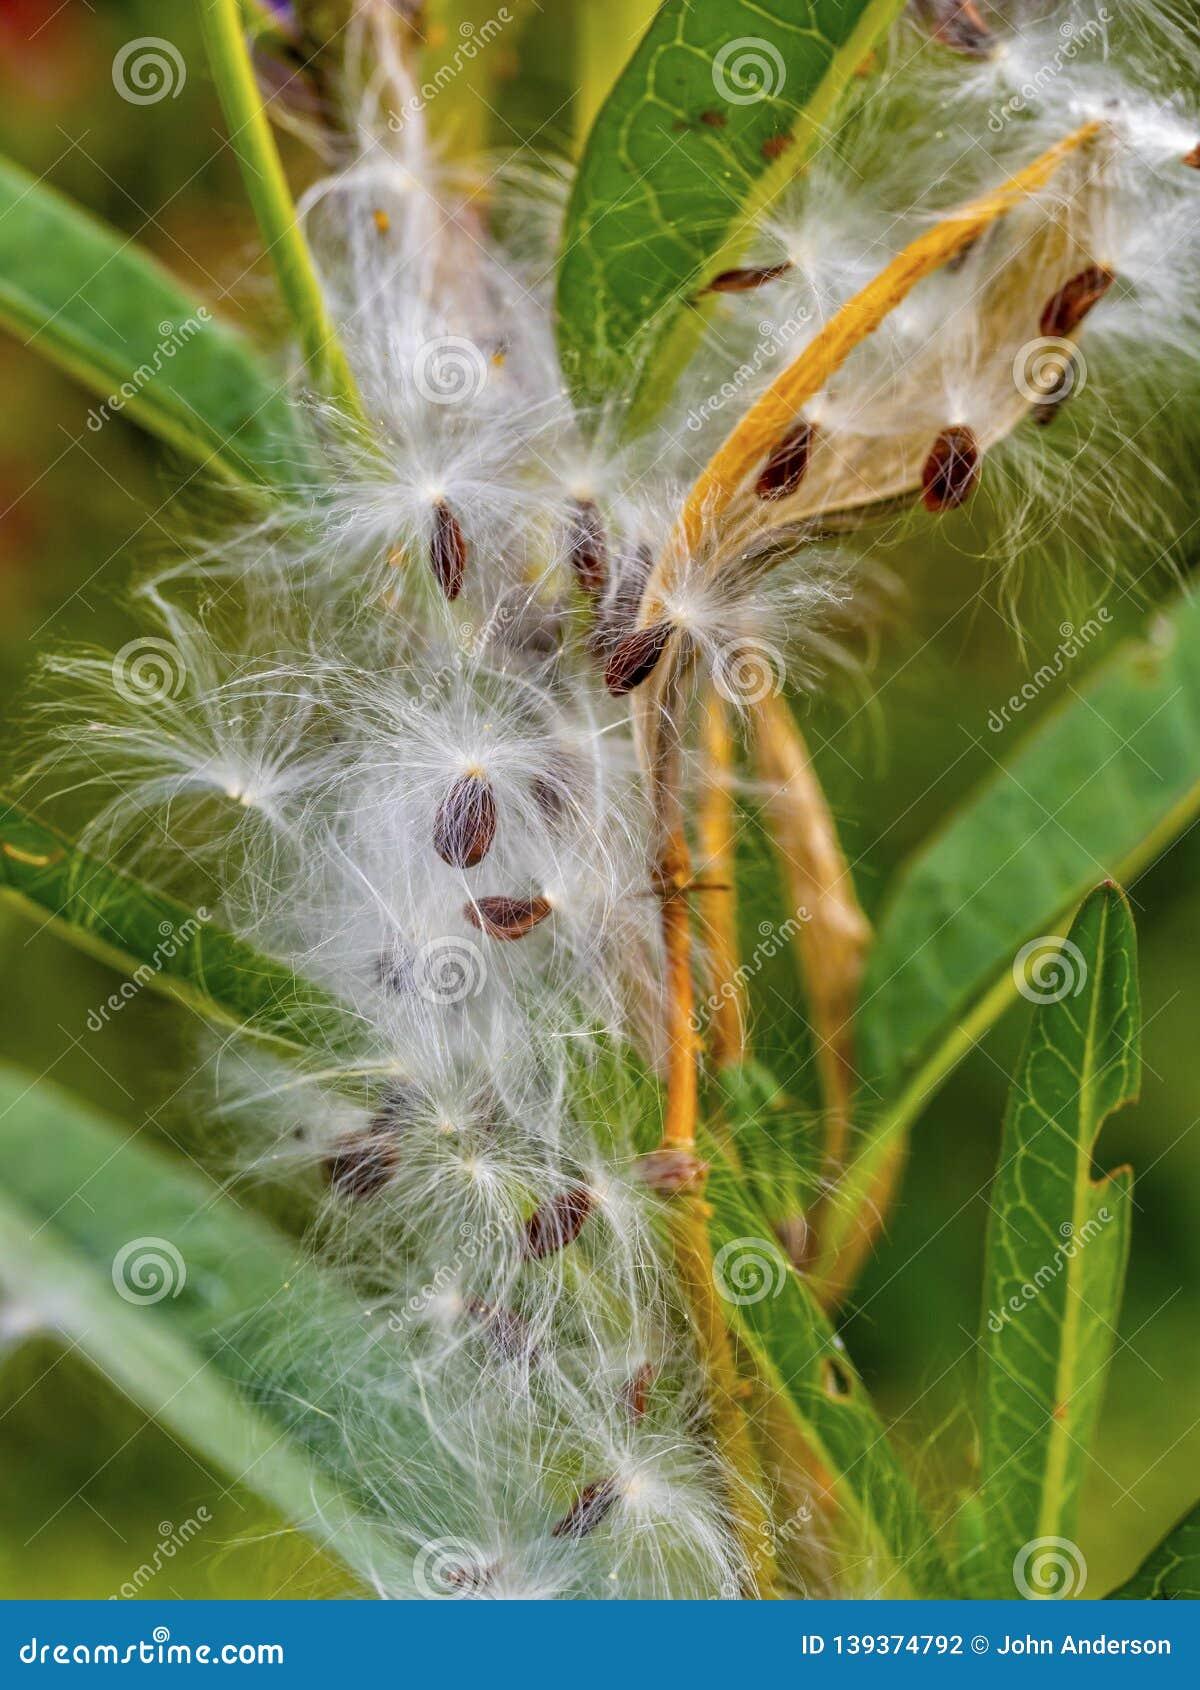 Common milkweed, butterfly flower